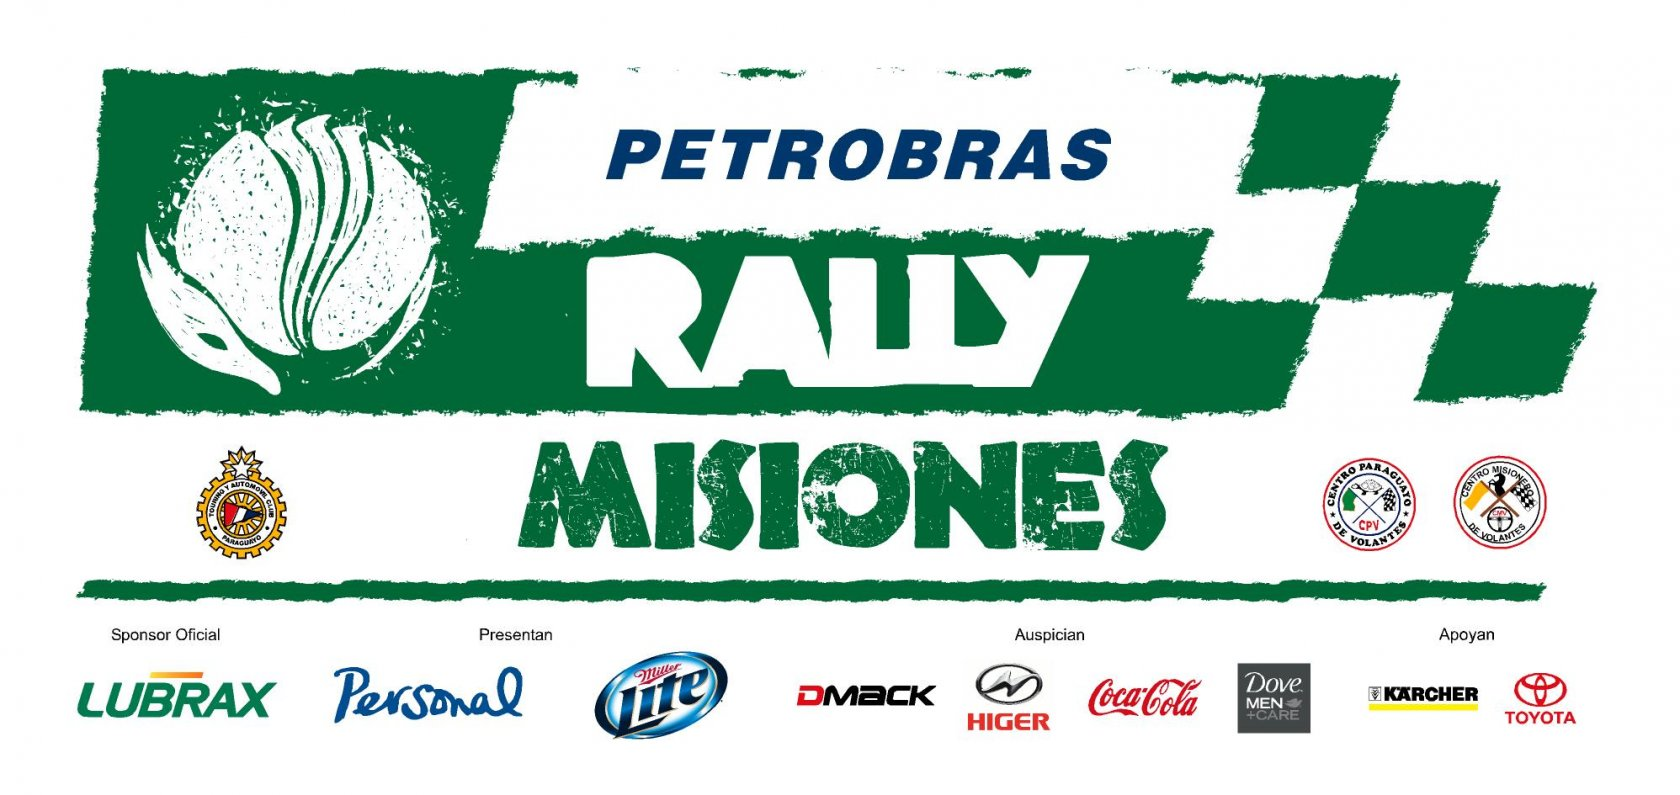 logo misiones 2013.jpg